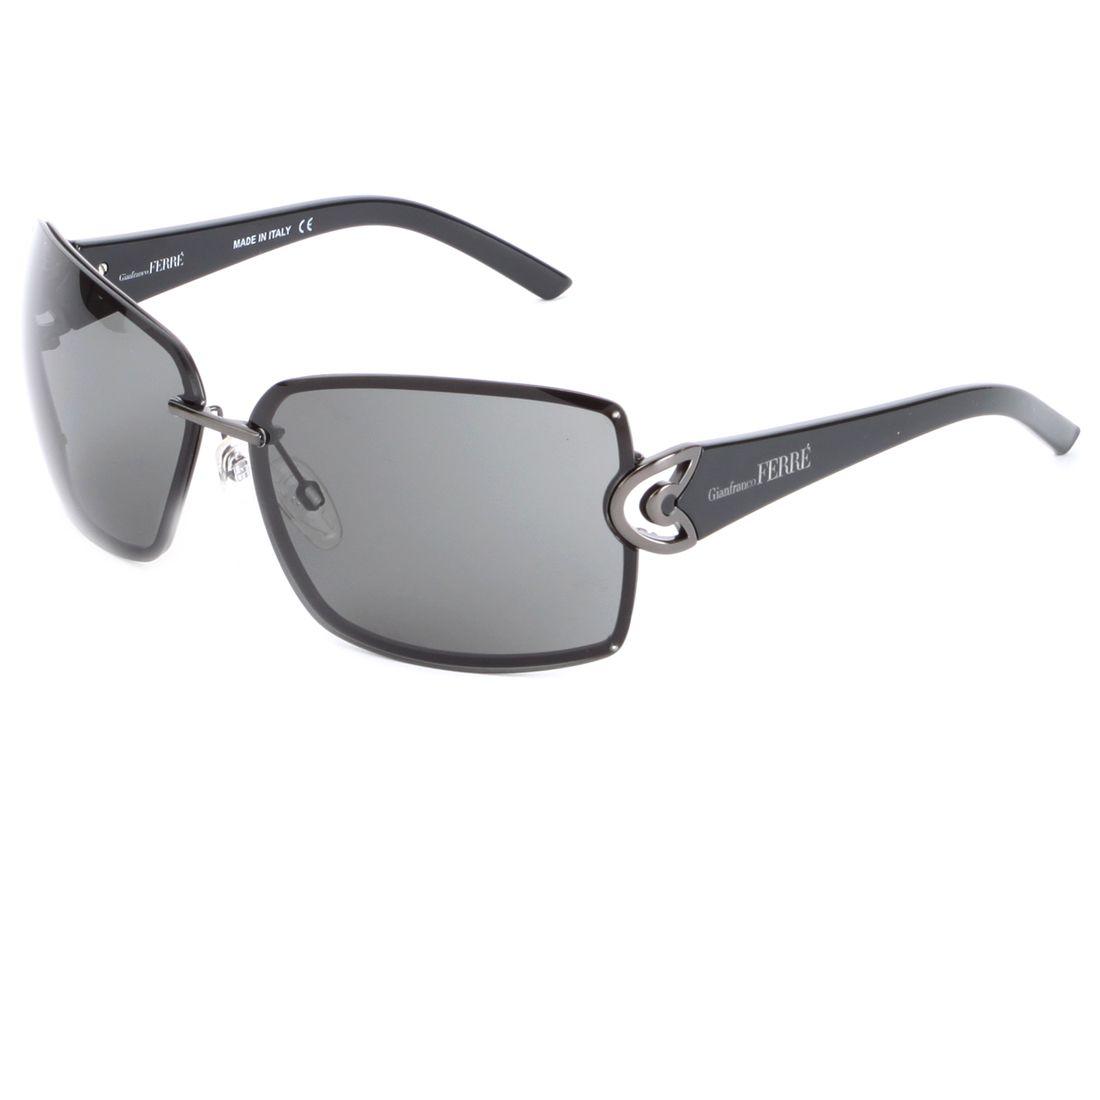 207e26f3d1de6 Gianfranco Ferre GF 949 01 Sunglasses - Gun Black - My collection from top   designers